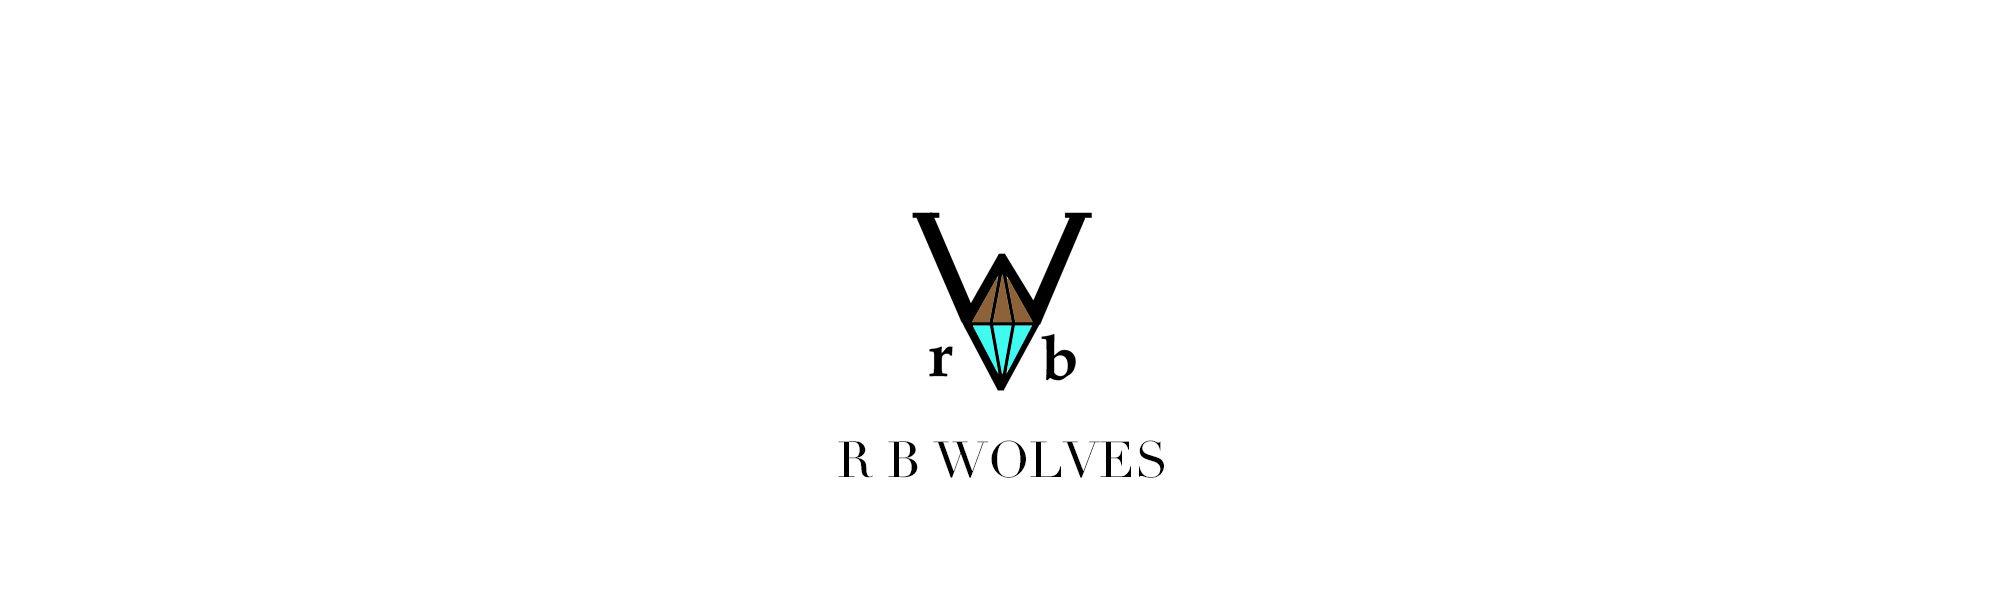 R B WOLVES